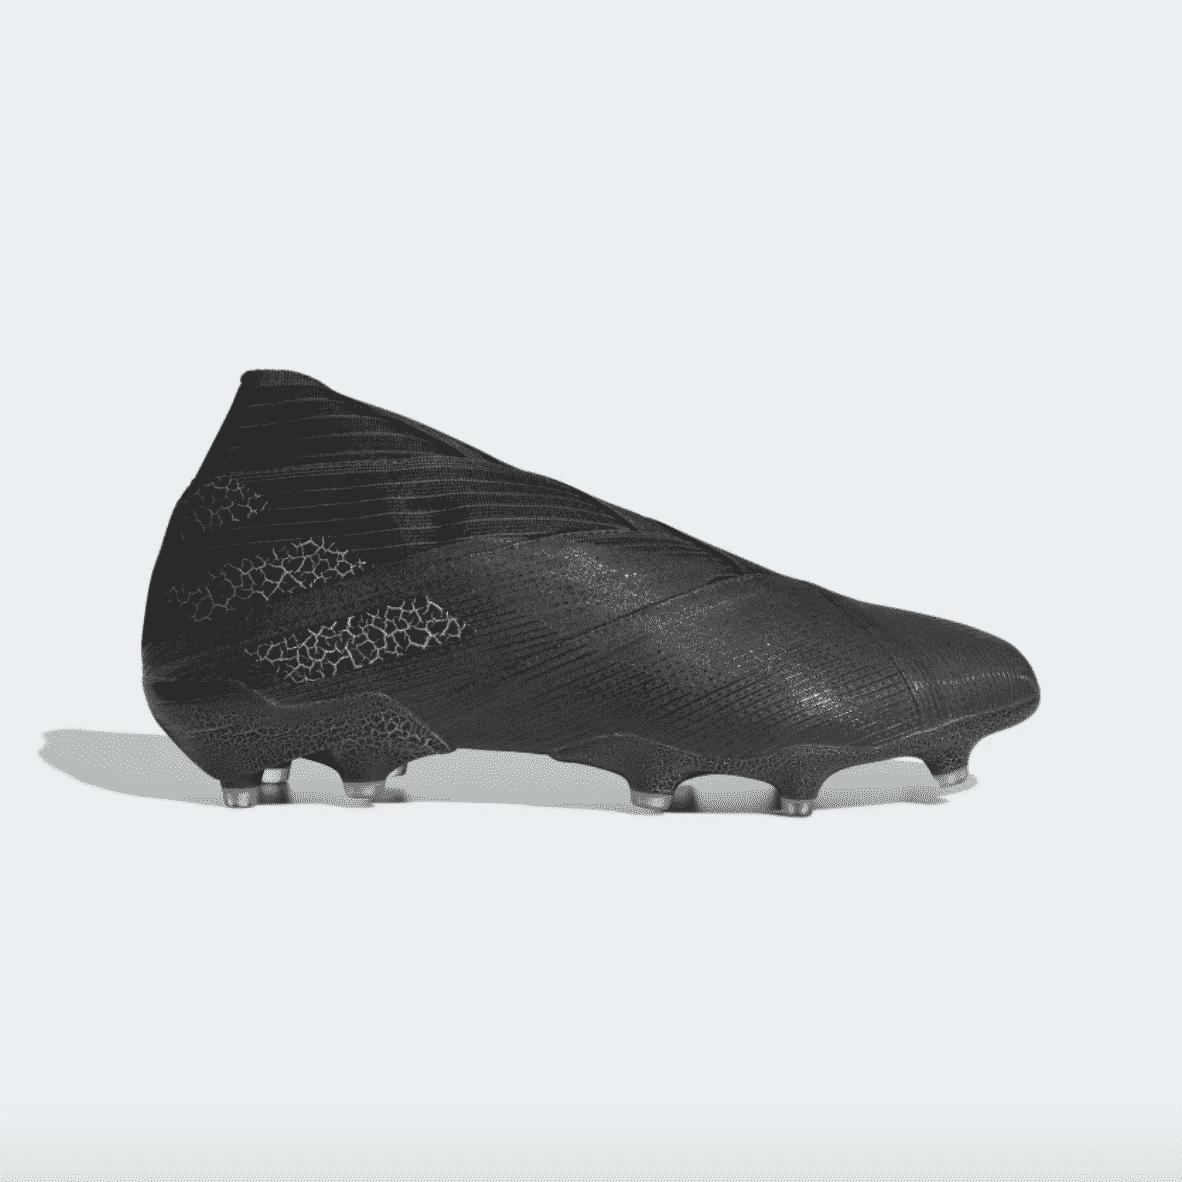 adidas-nemeziz-shadowbeast-janvier-2020-1